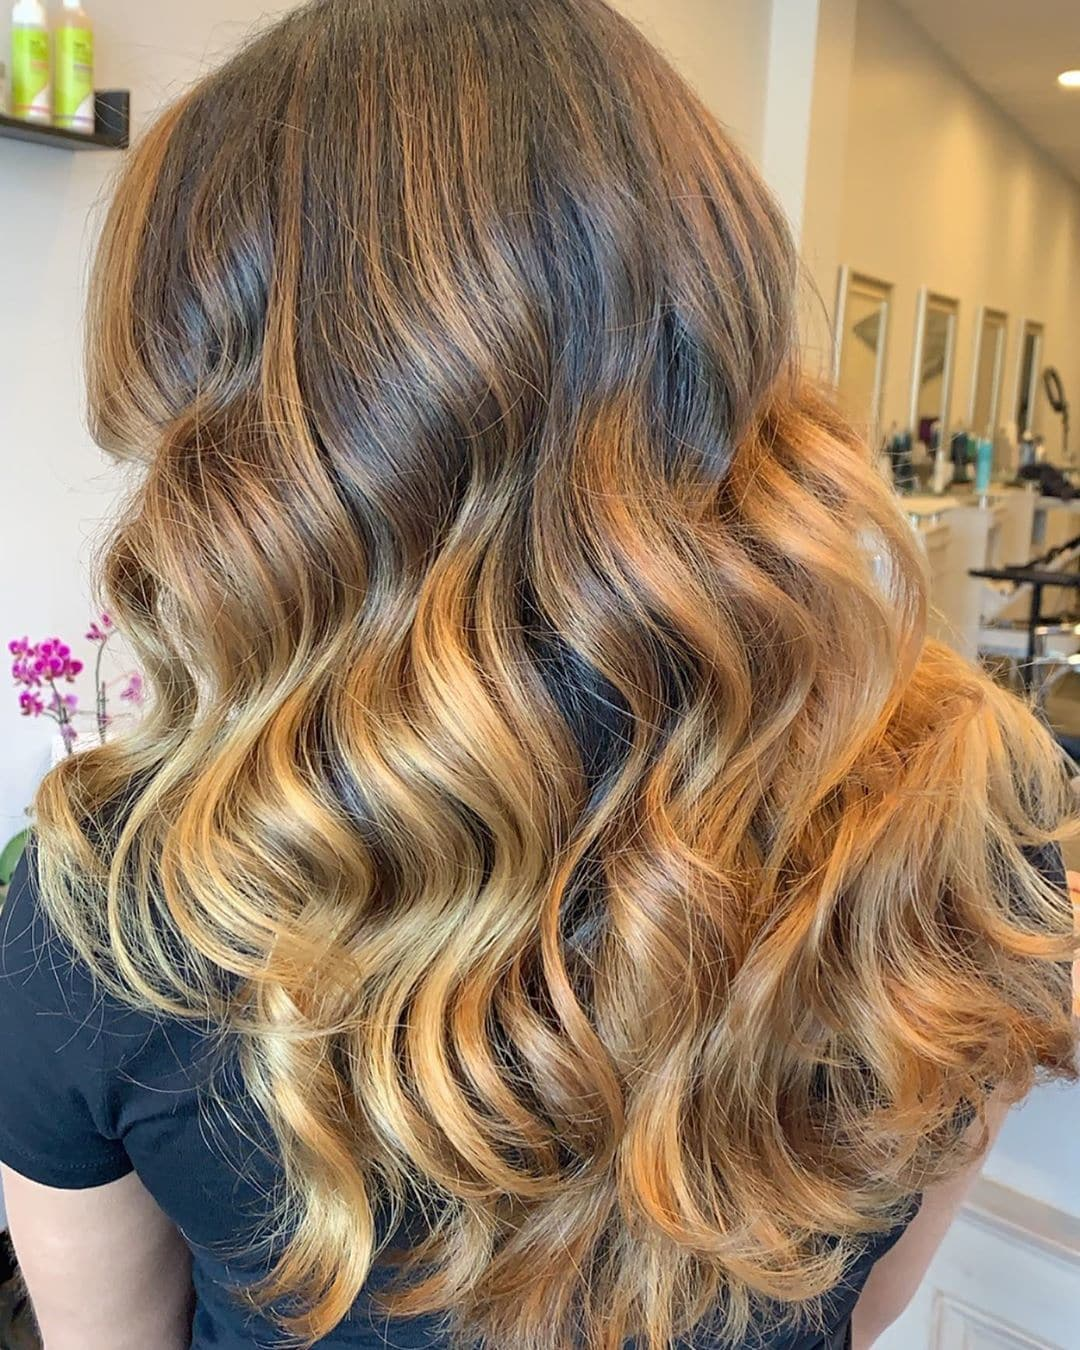 Woman with long wavy caramel honey blonde hair